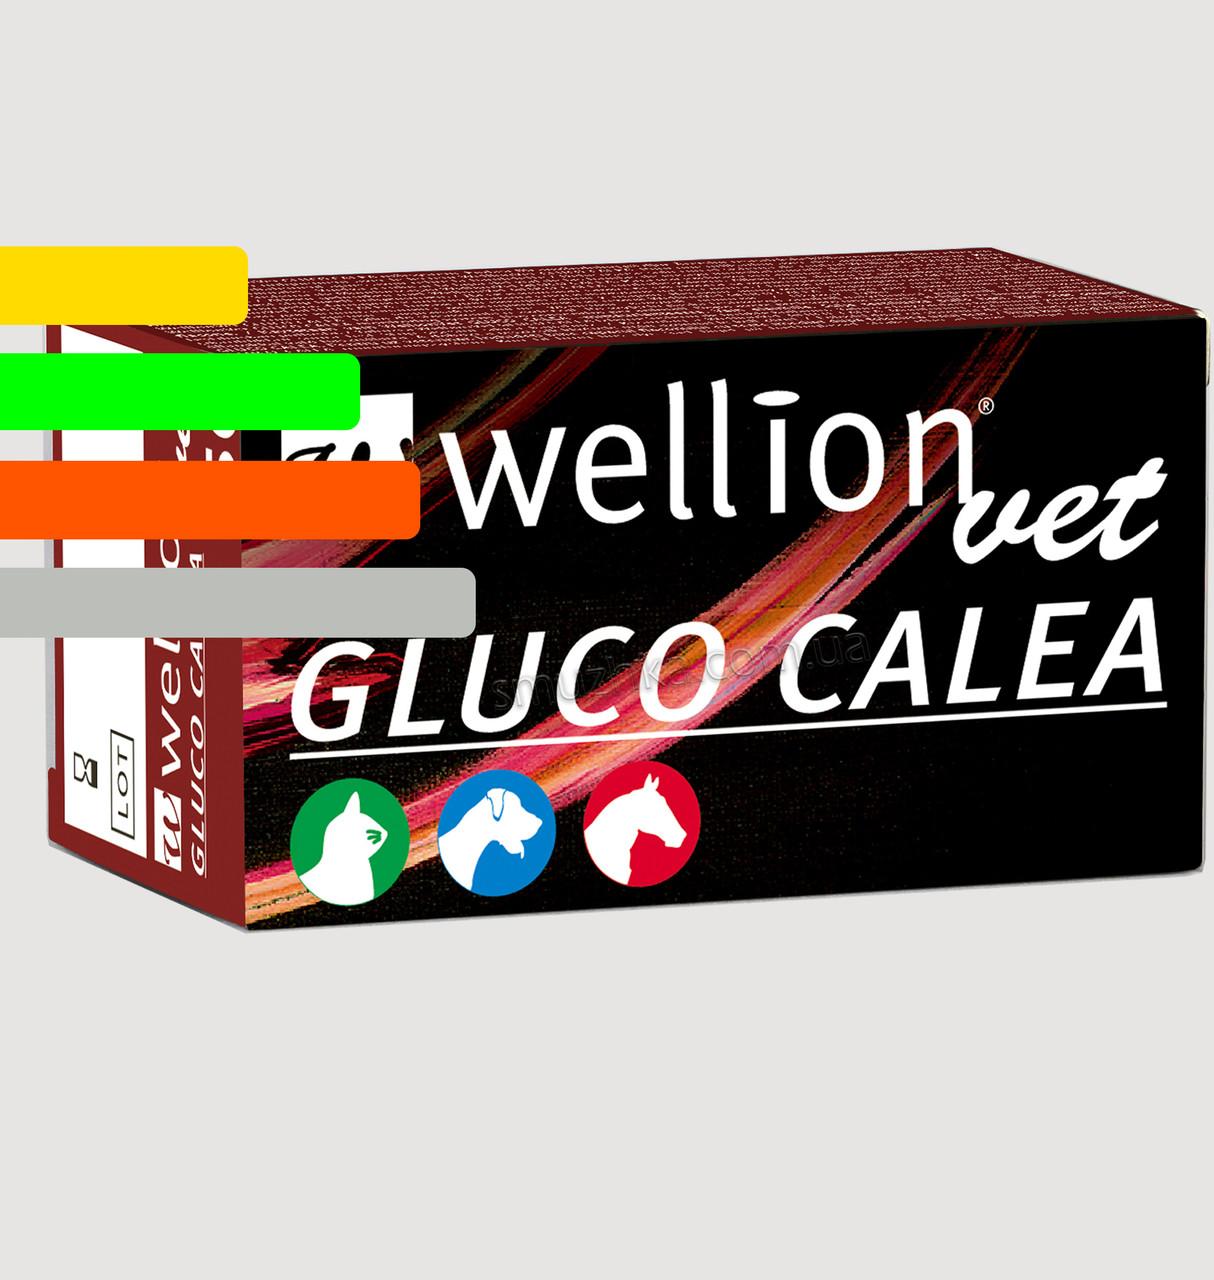 Тест-полоски Wellion Vet Gluco Calea #50 - Глюко Калеа